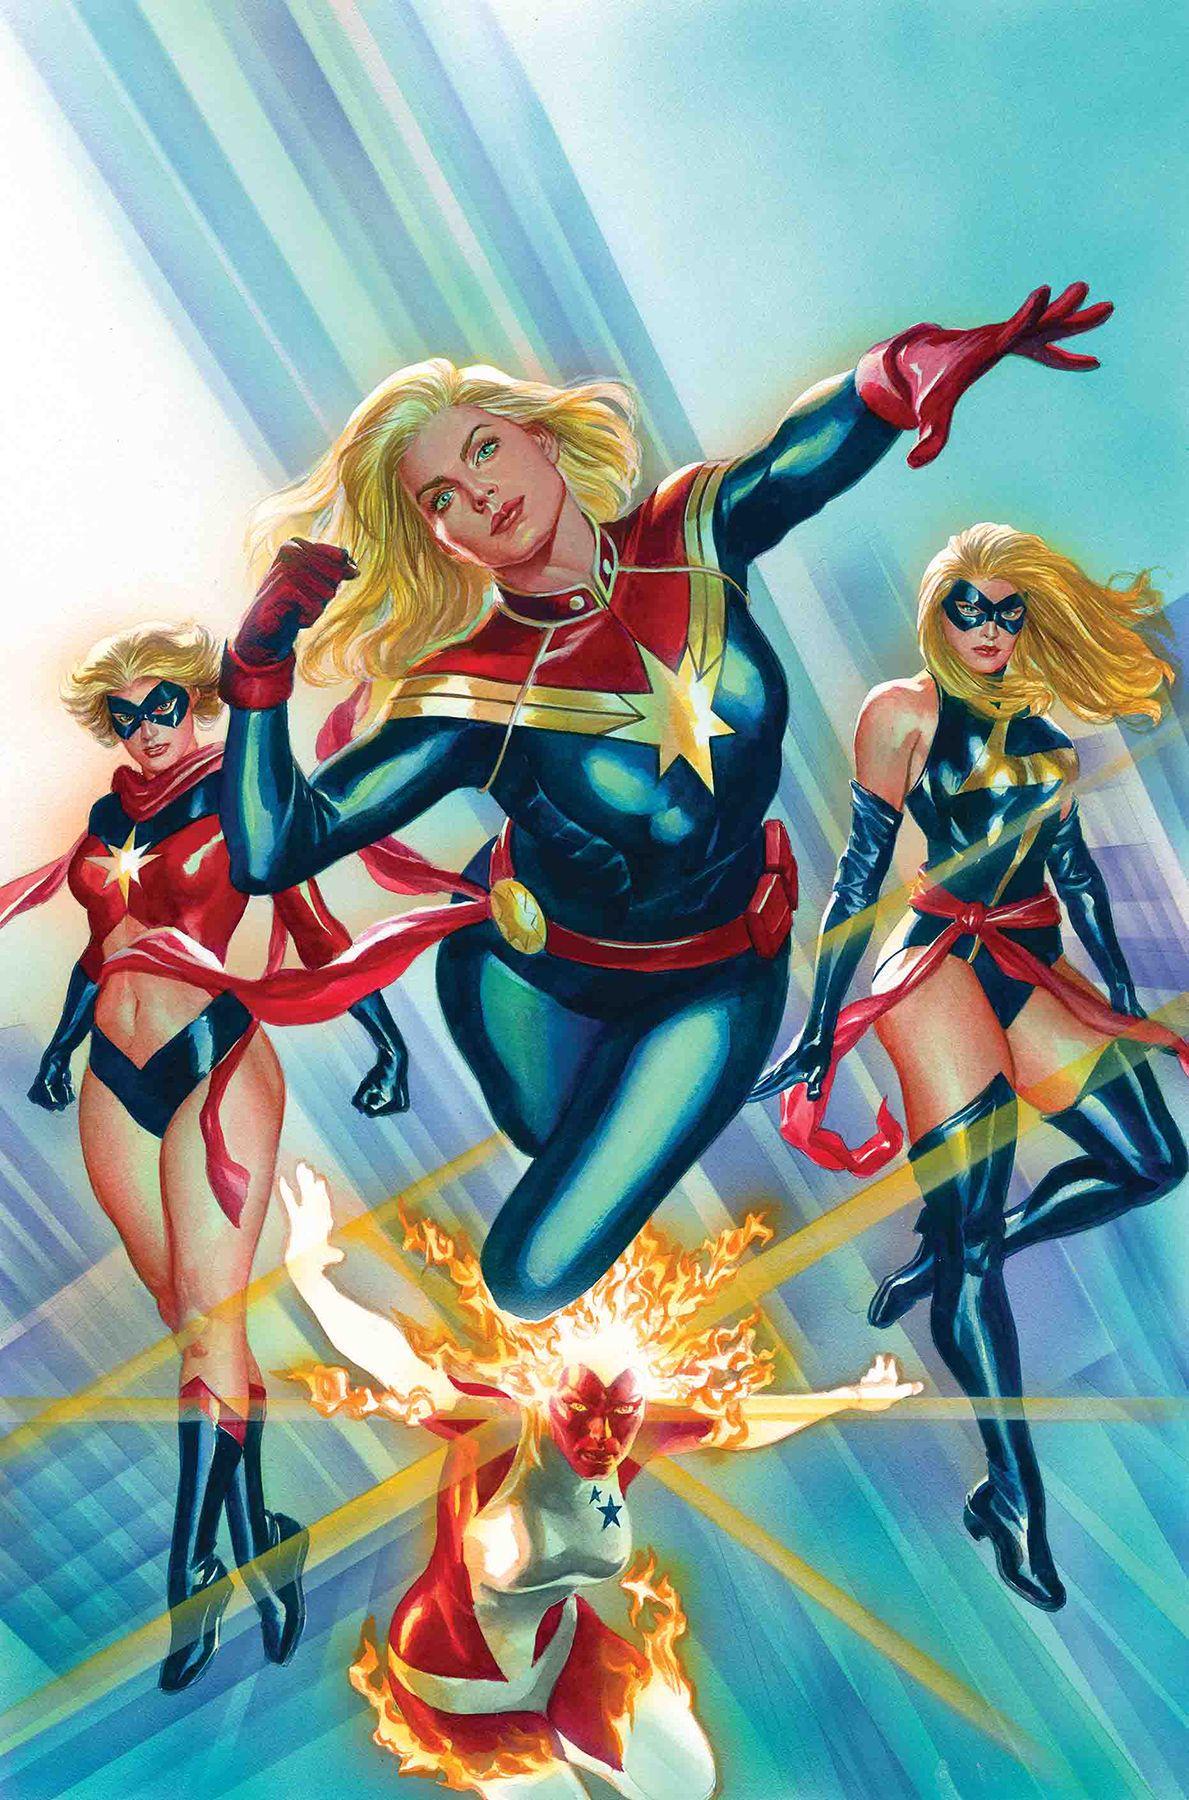 Captain Marvel #1 Alex Ross Variant Cover | Ms marvel captain marvel, Marvel  universe characters, Marvel comics art